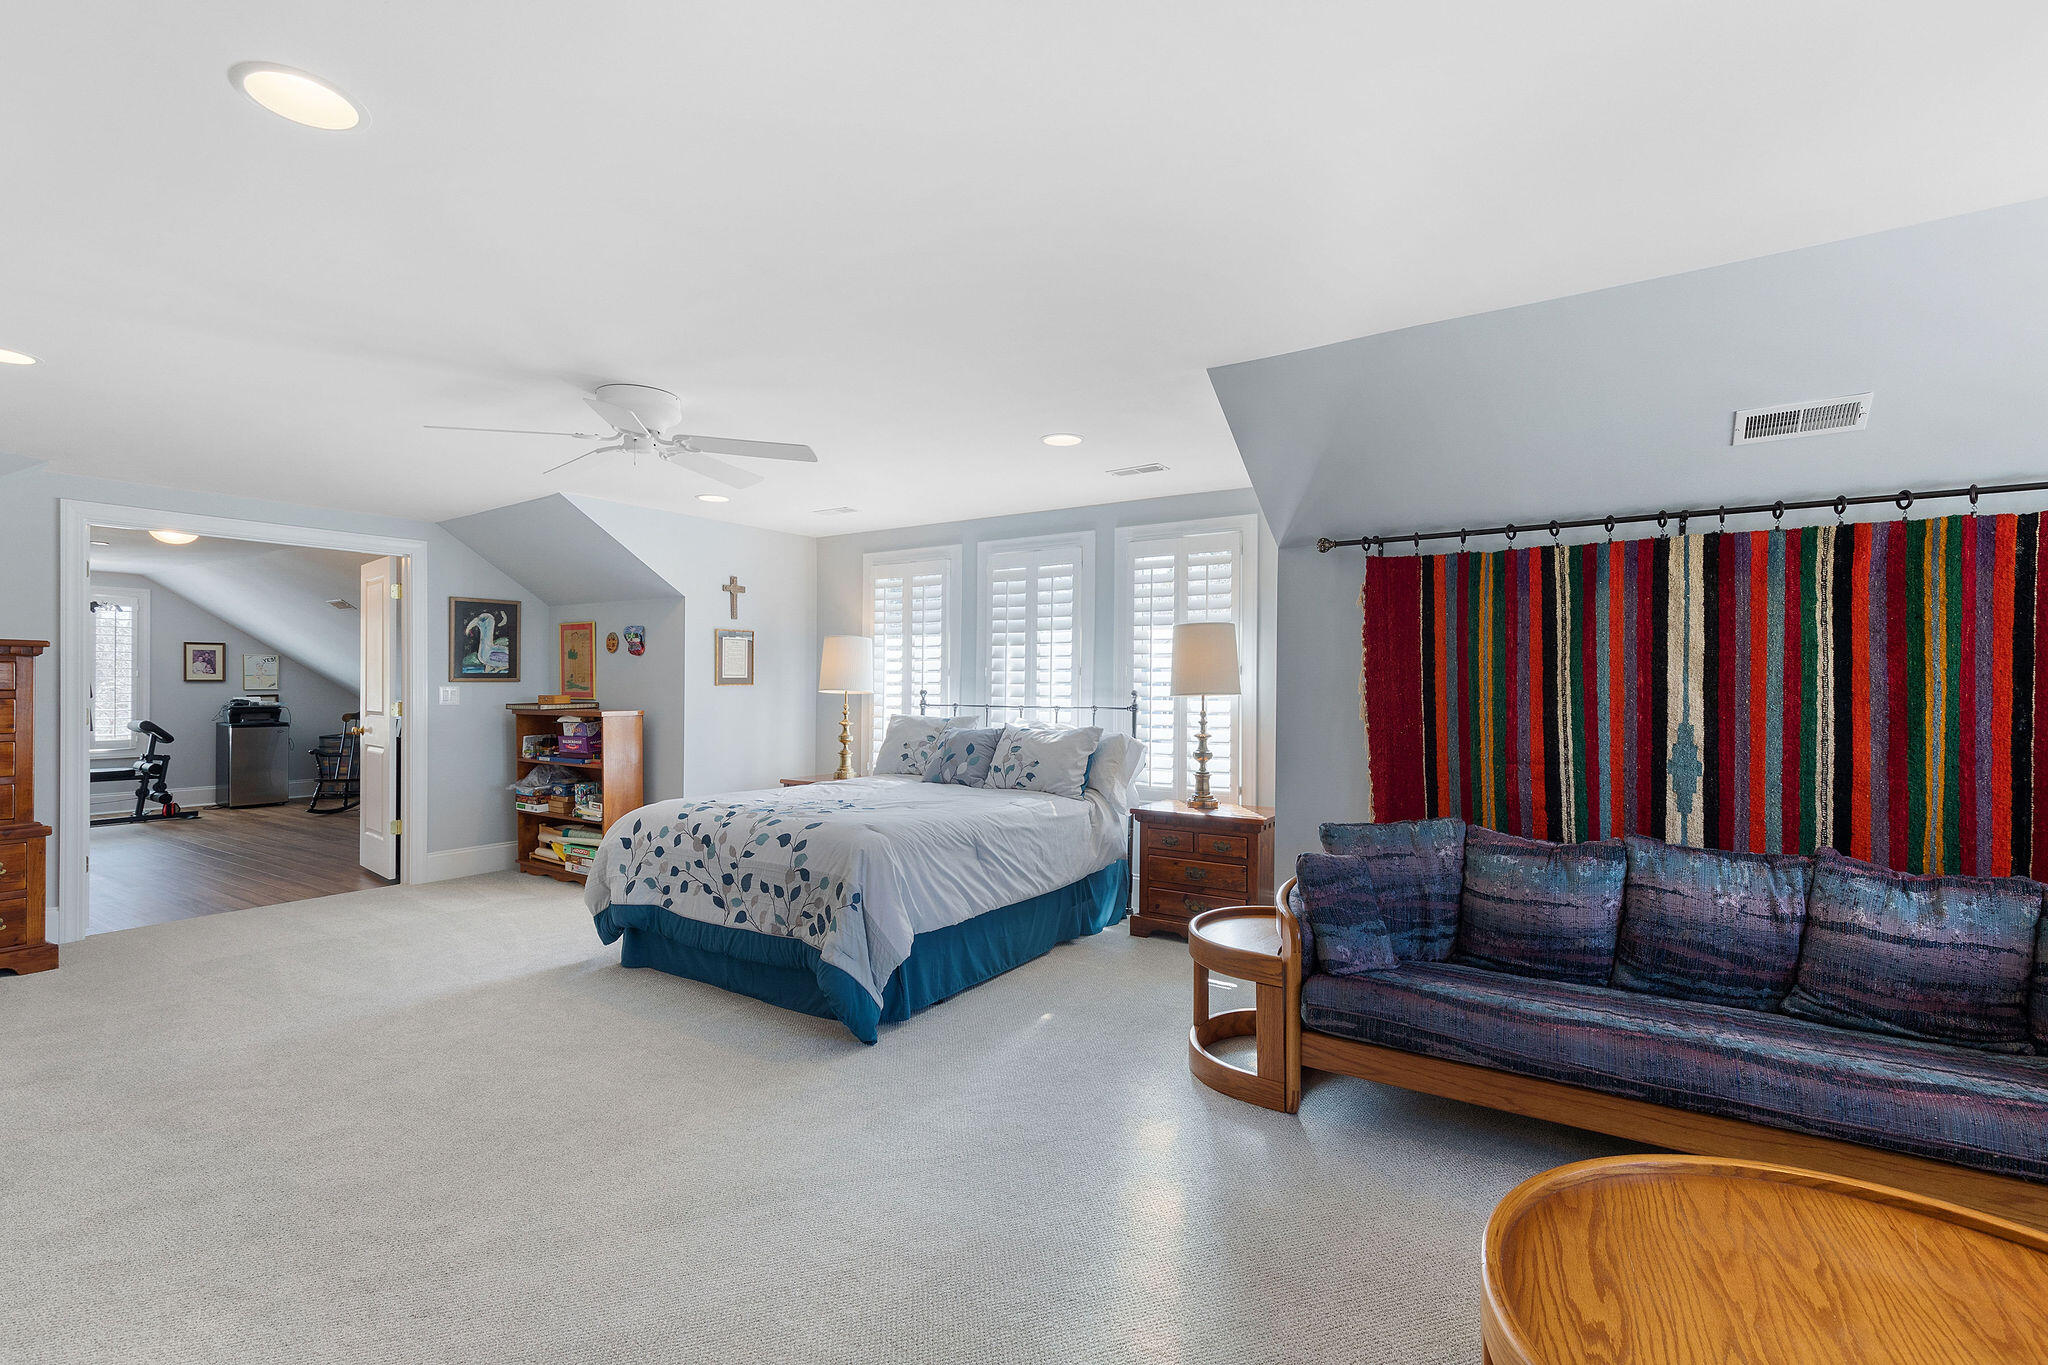 Back Bay Village Homes For Sale - 244 Indigo Bay Circle, Mount Pleasant, SC - 79